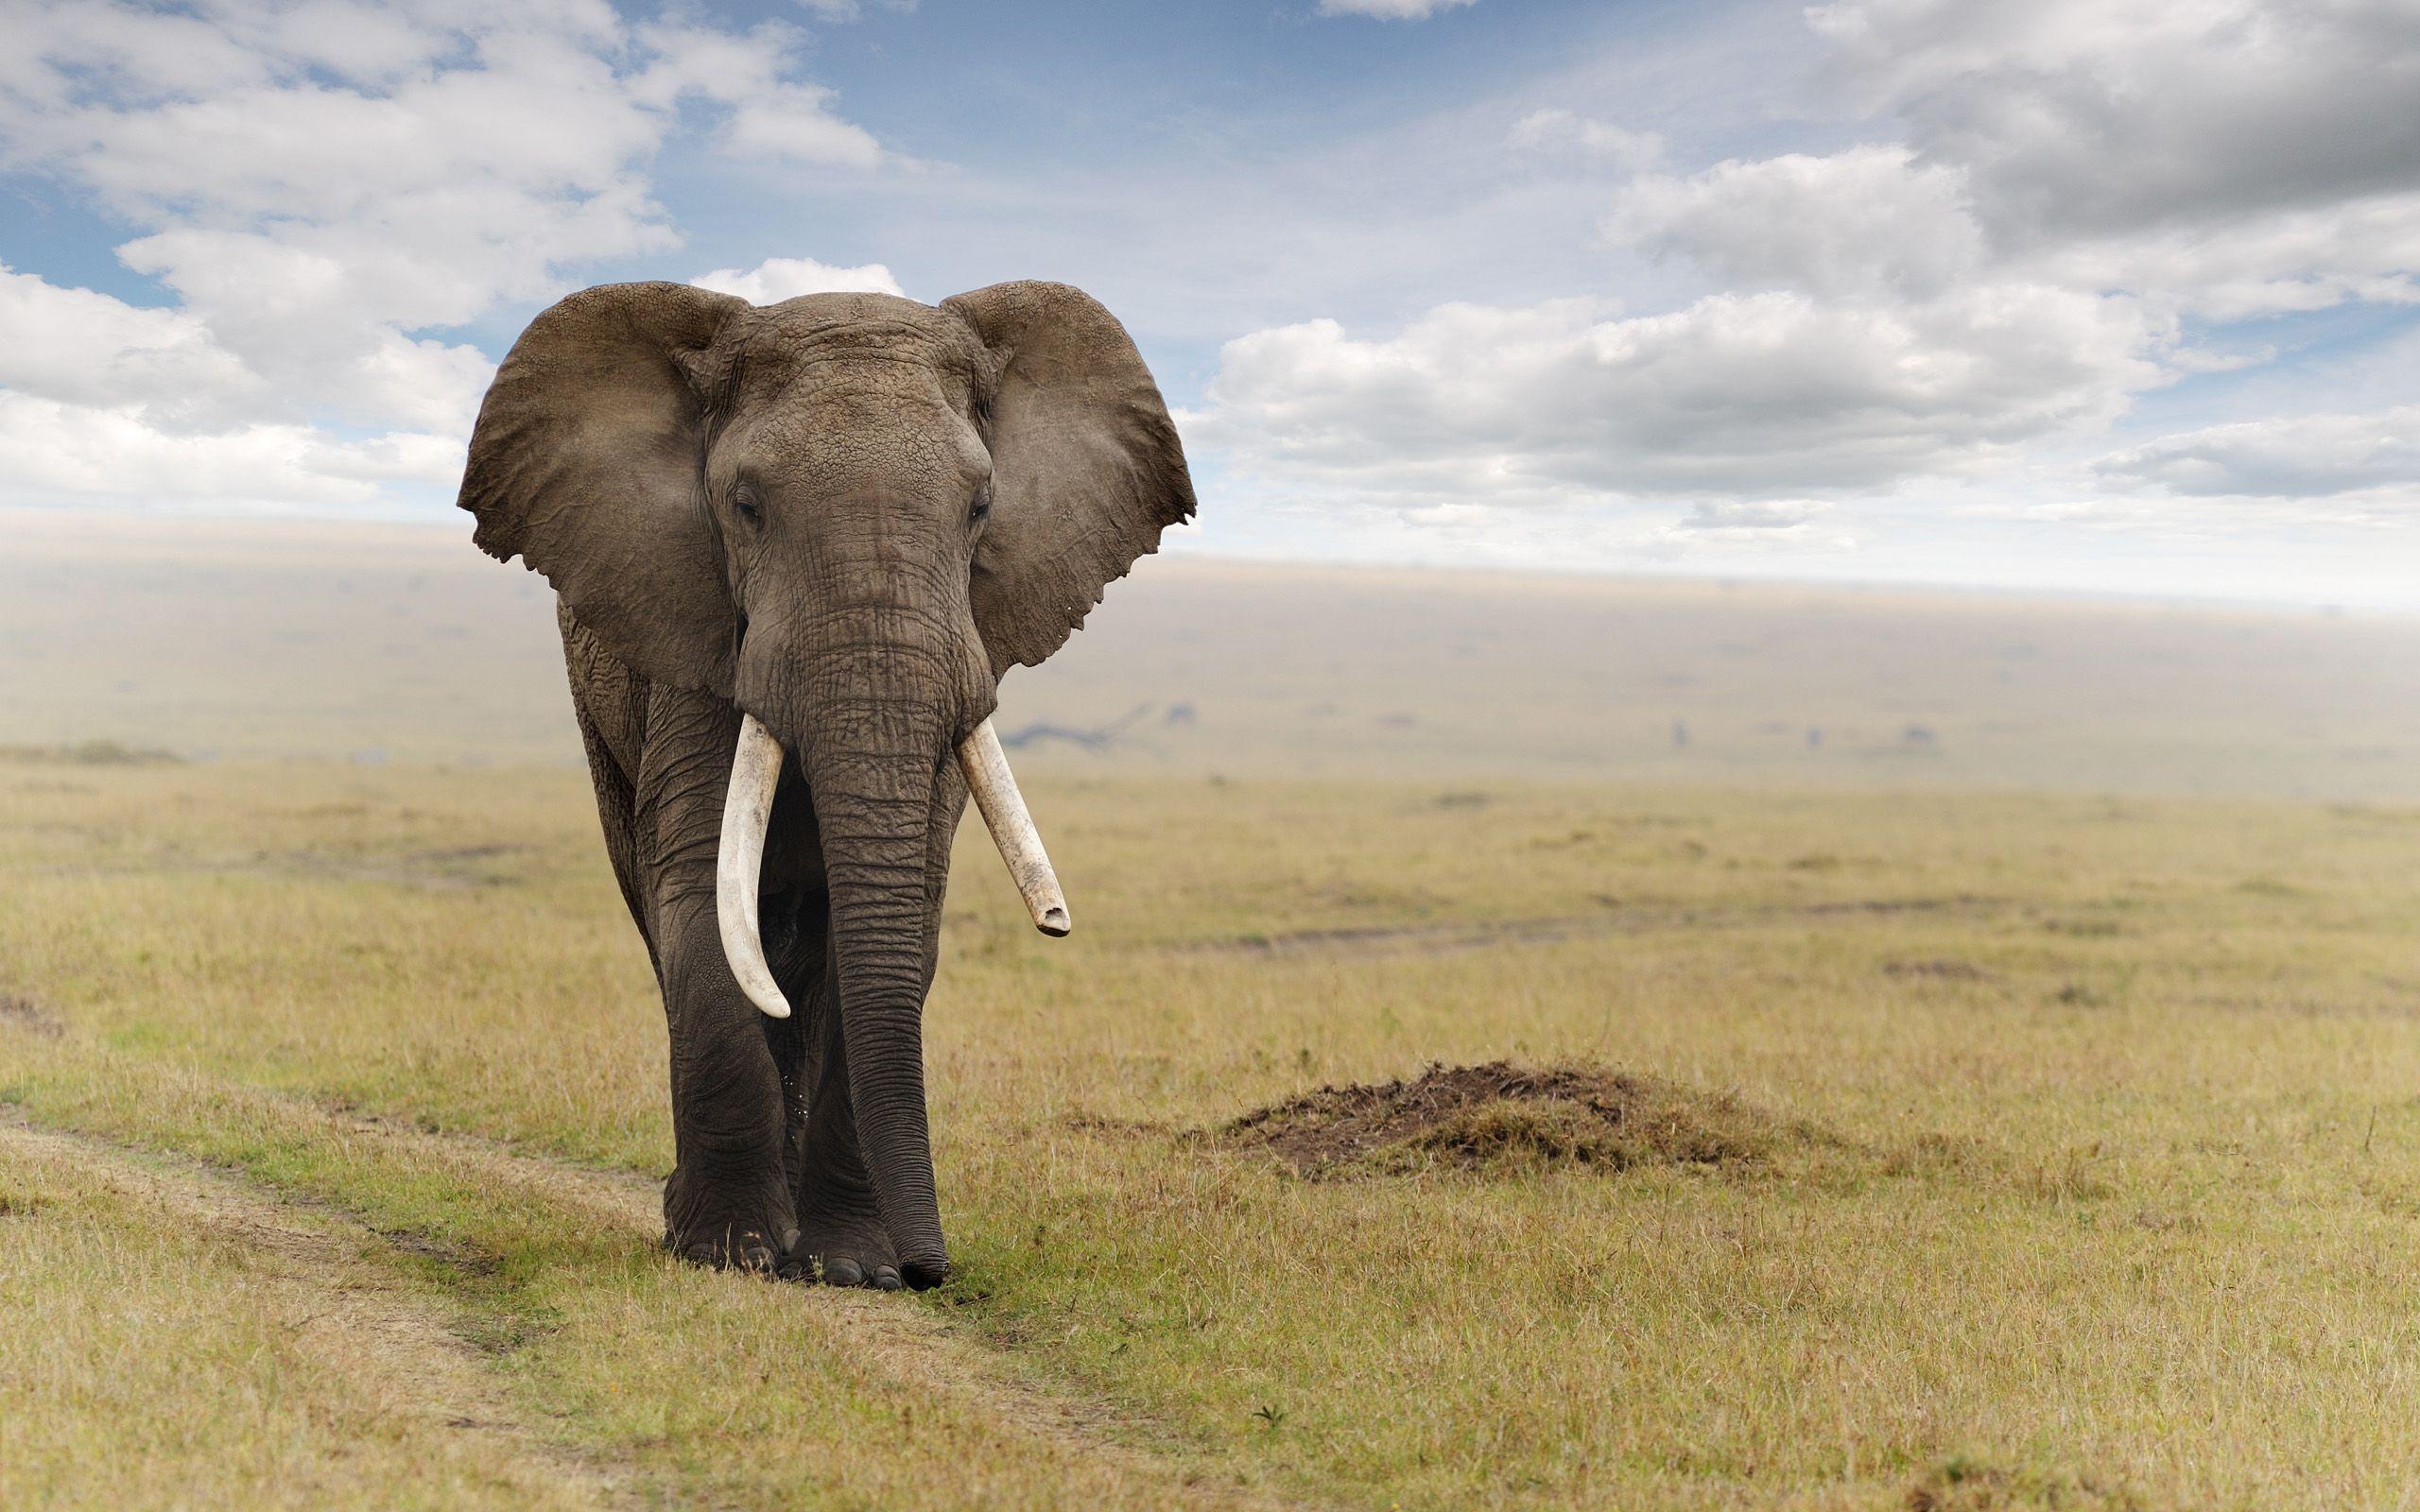 Elephant Computer Wallpapers Desktop Backgrounds 2560x1600 Id 344812 Elephant Wallpaper Elephant Pictures African Elephant